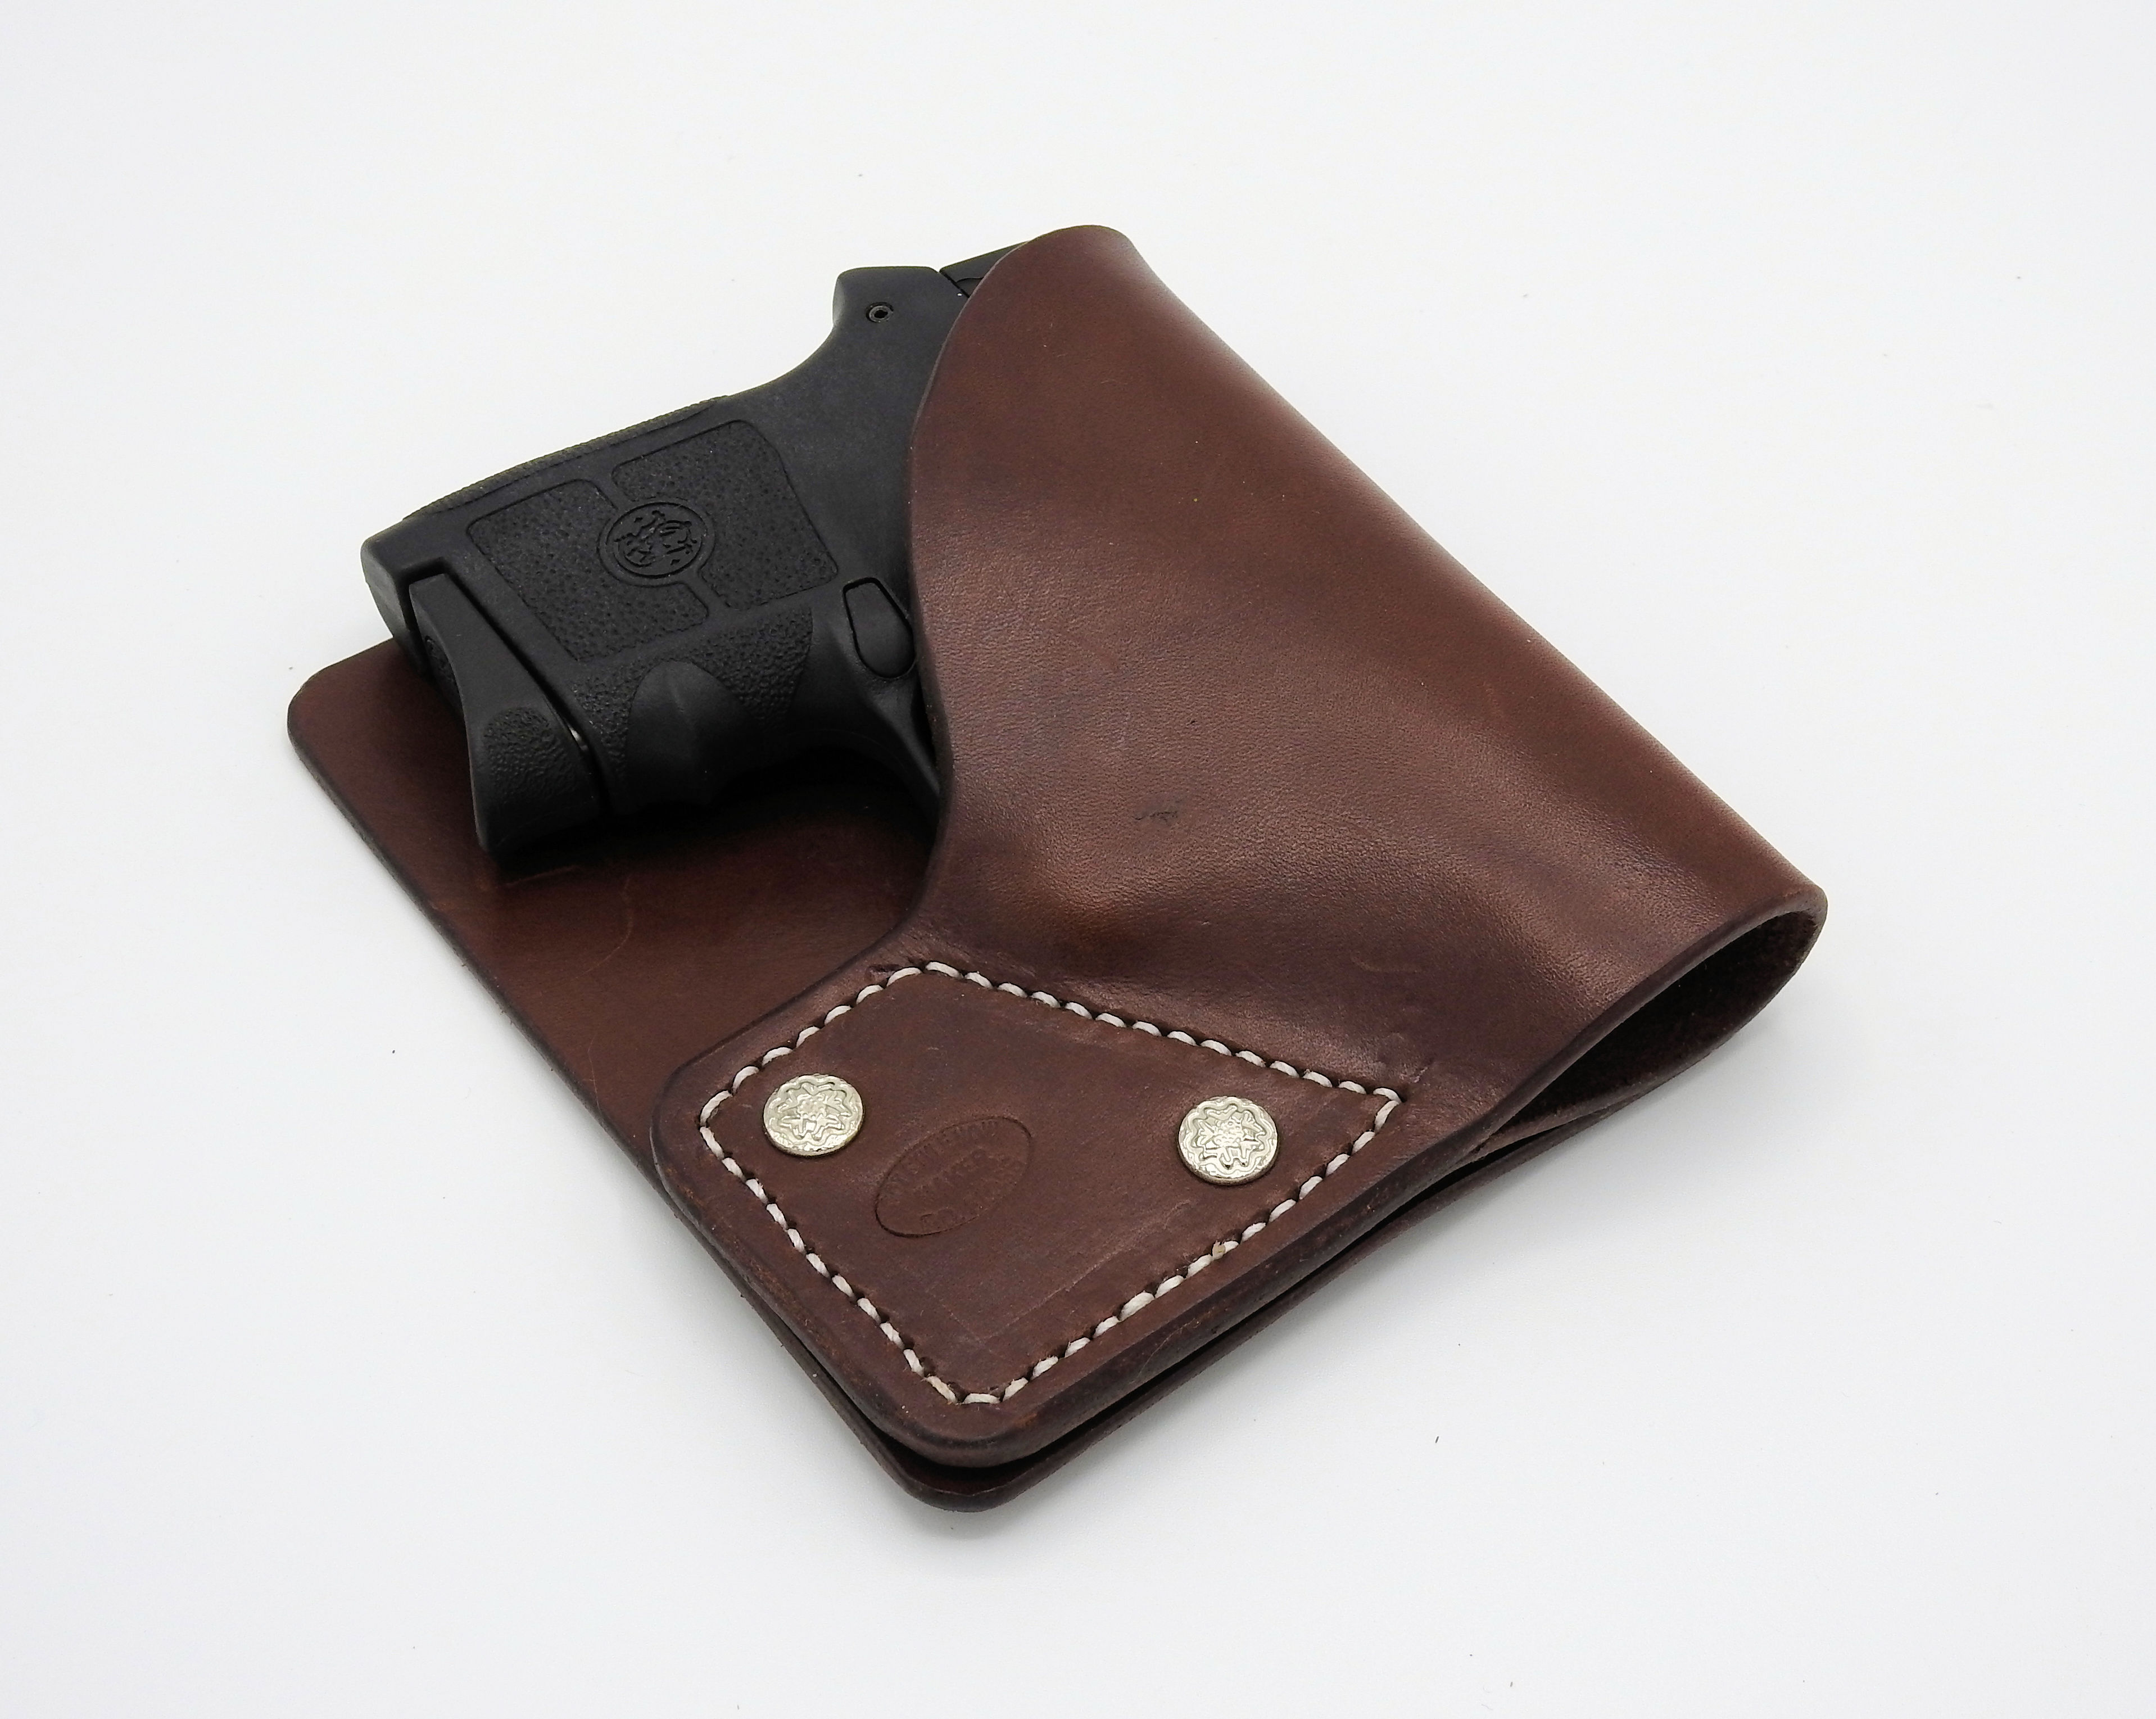 Leather Pocket Holster S&W Bodyguard 380 KAHR P380 Ruger LCP Pistol  Adjustable 3 in 1 Brown